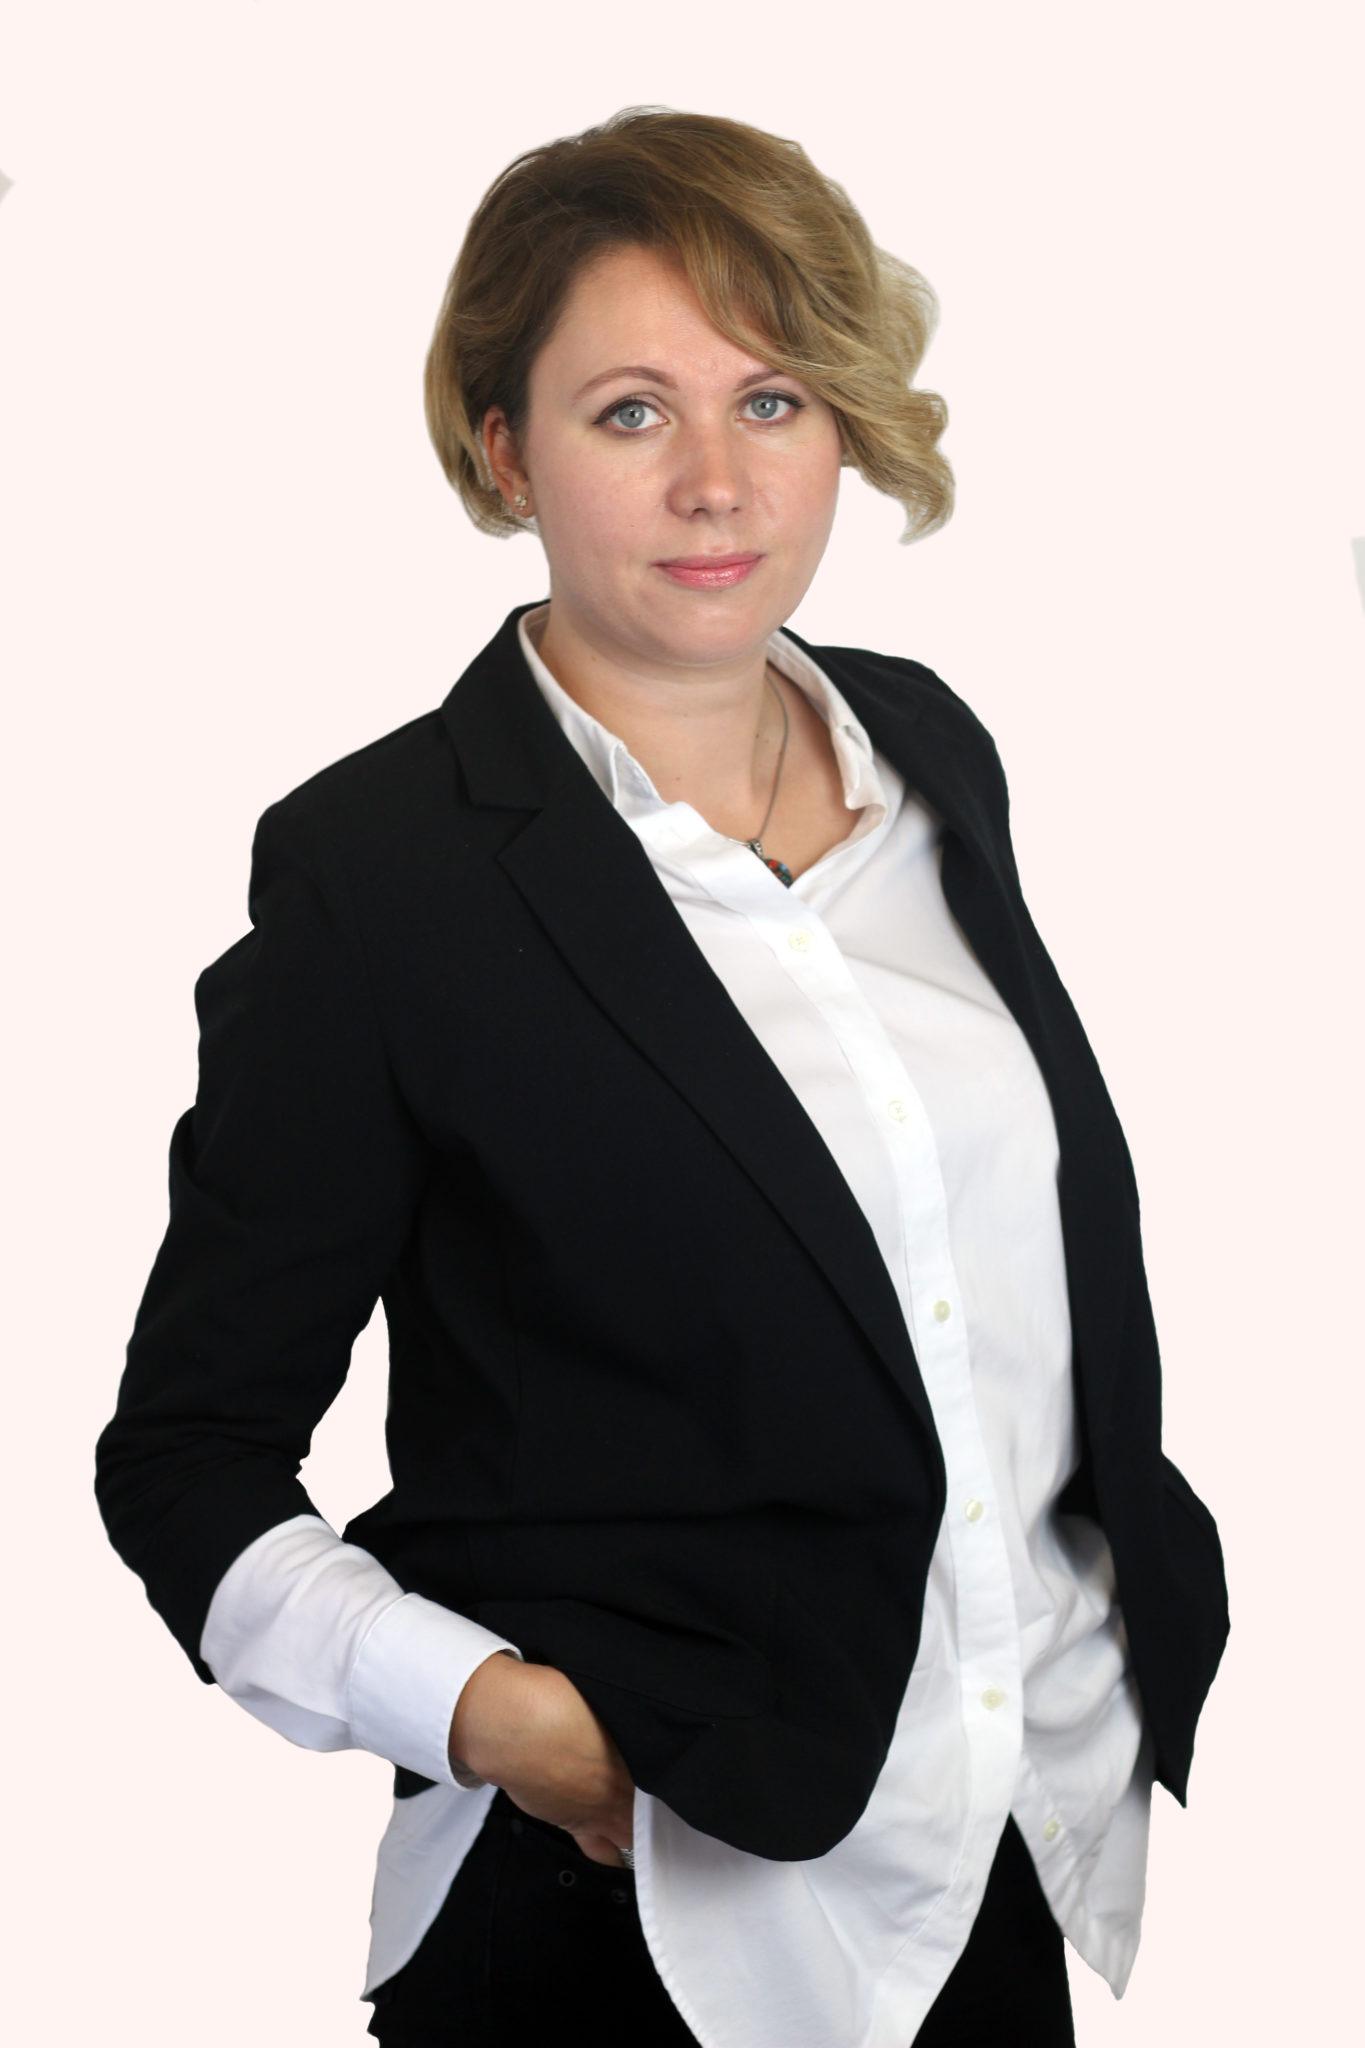 викладач Школи Креатив Катерина Калюжна